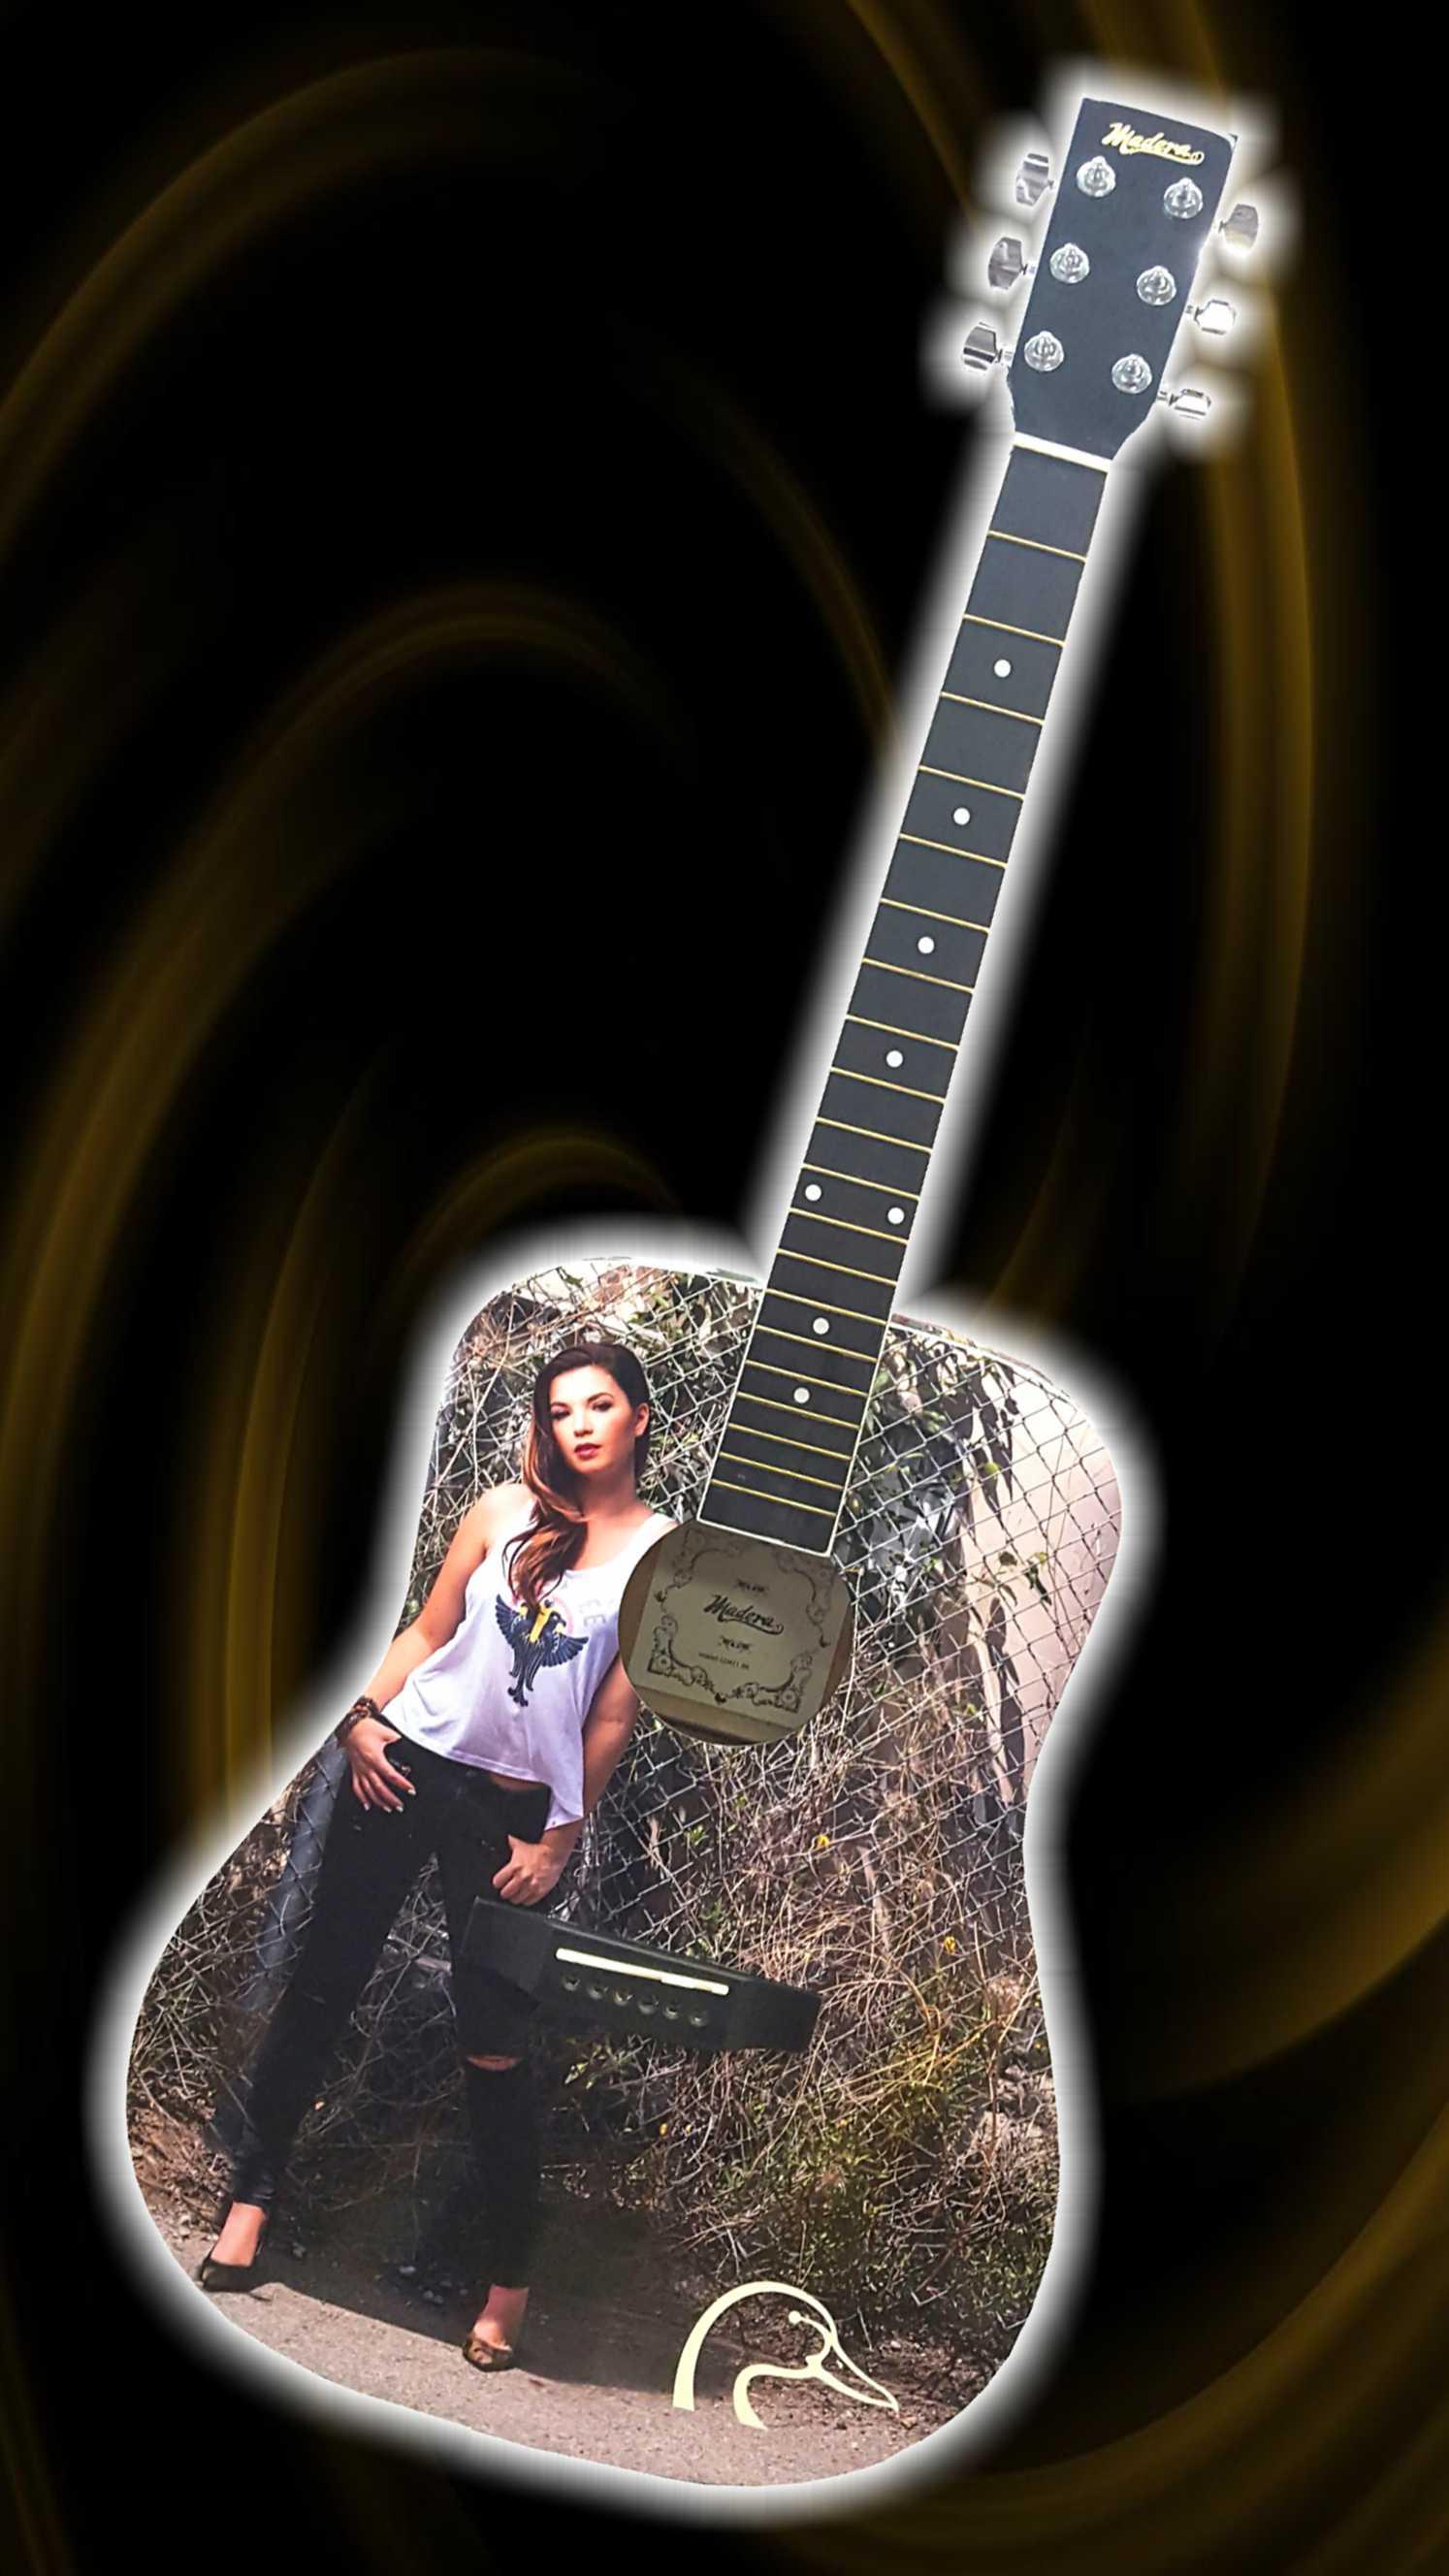 DUCS guitar